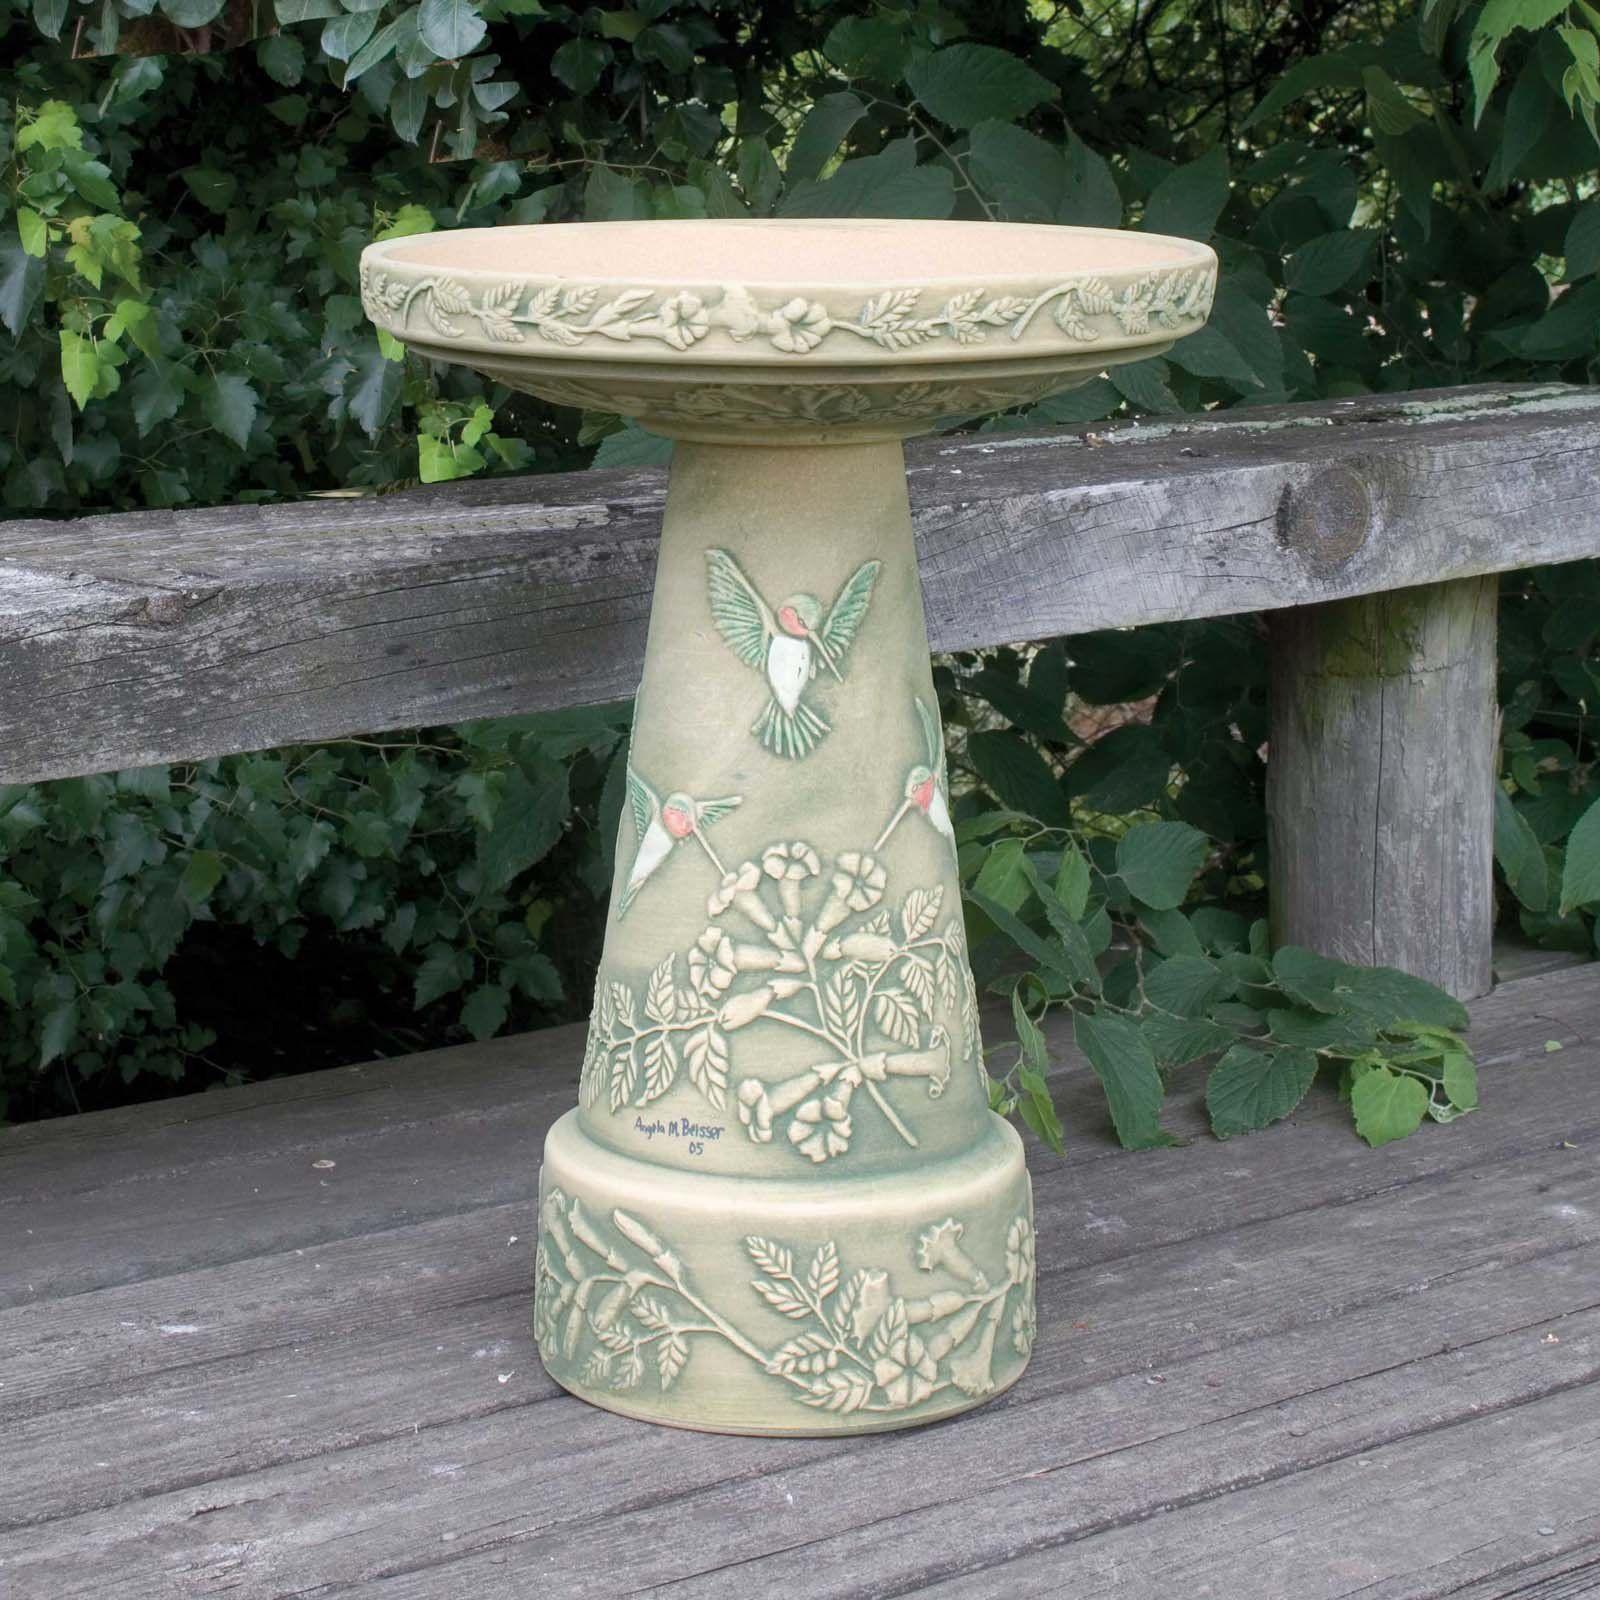 Burley Clay Hand Painted Hummingbird Ceramic Bird Bath